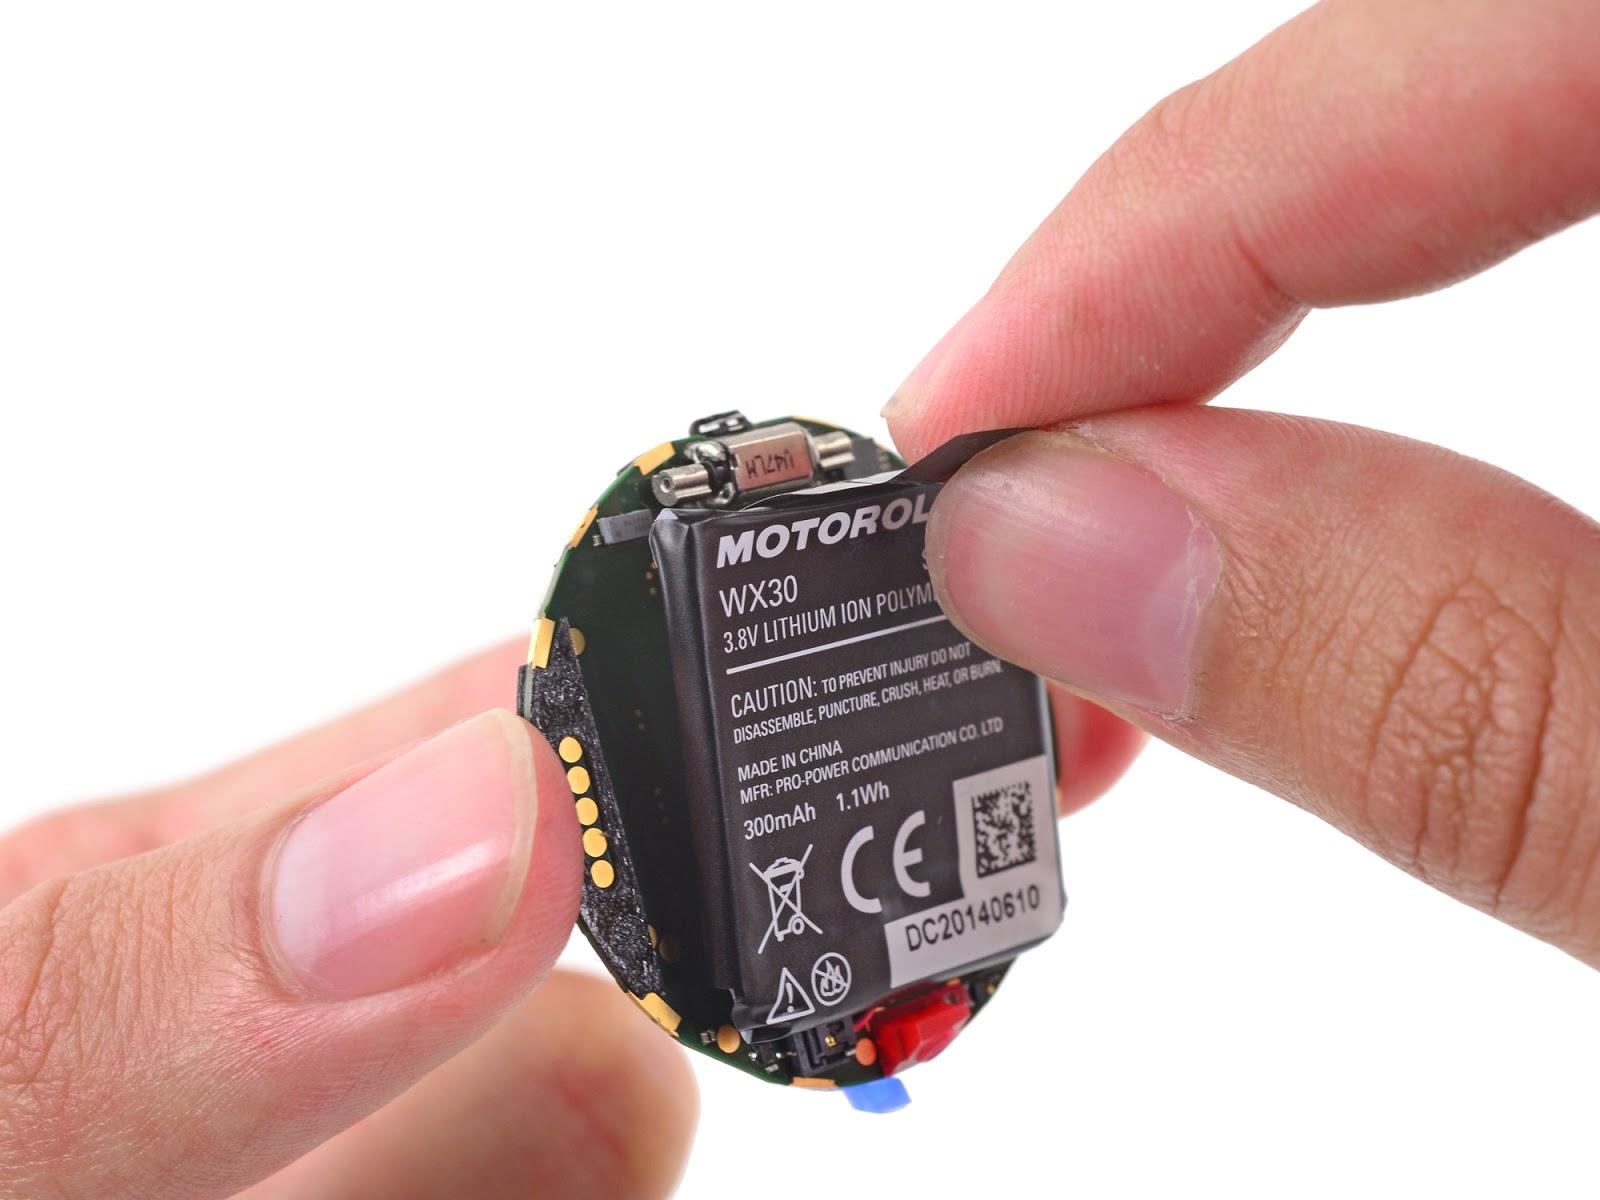 Smartwatch-ul Moto 360 dezasamblat de iFixit; surprize la interior